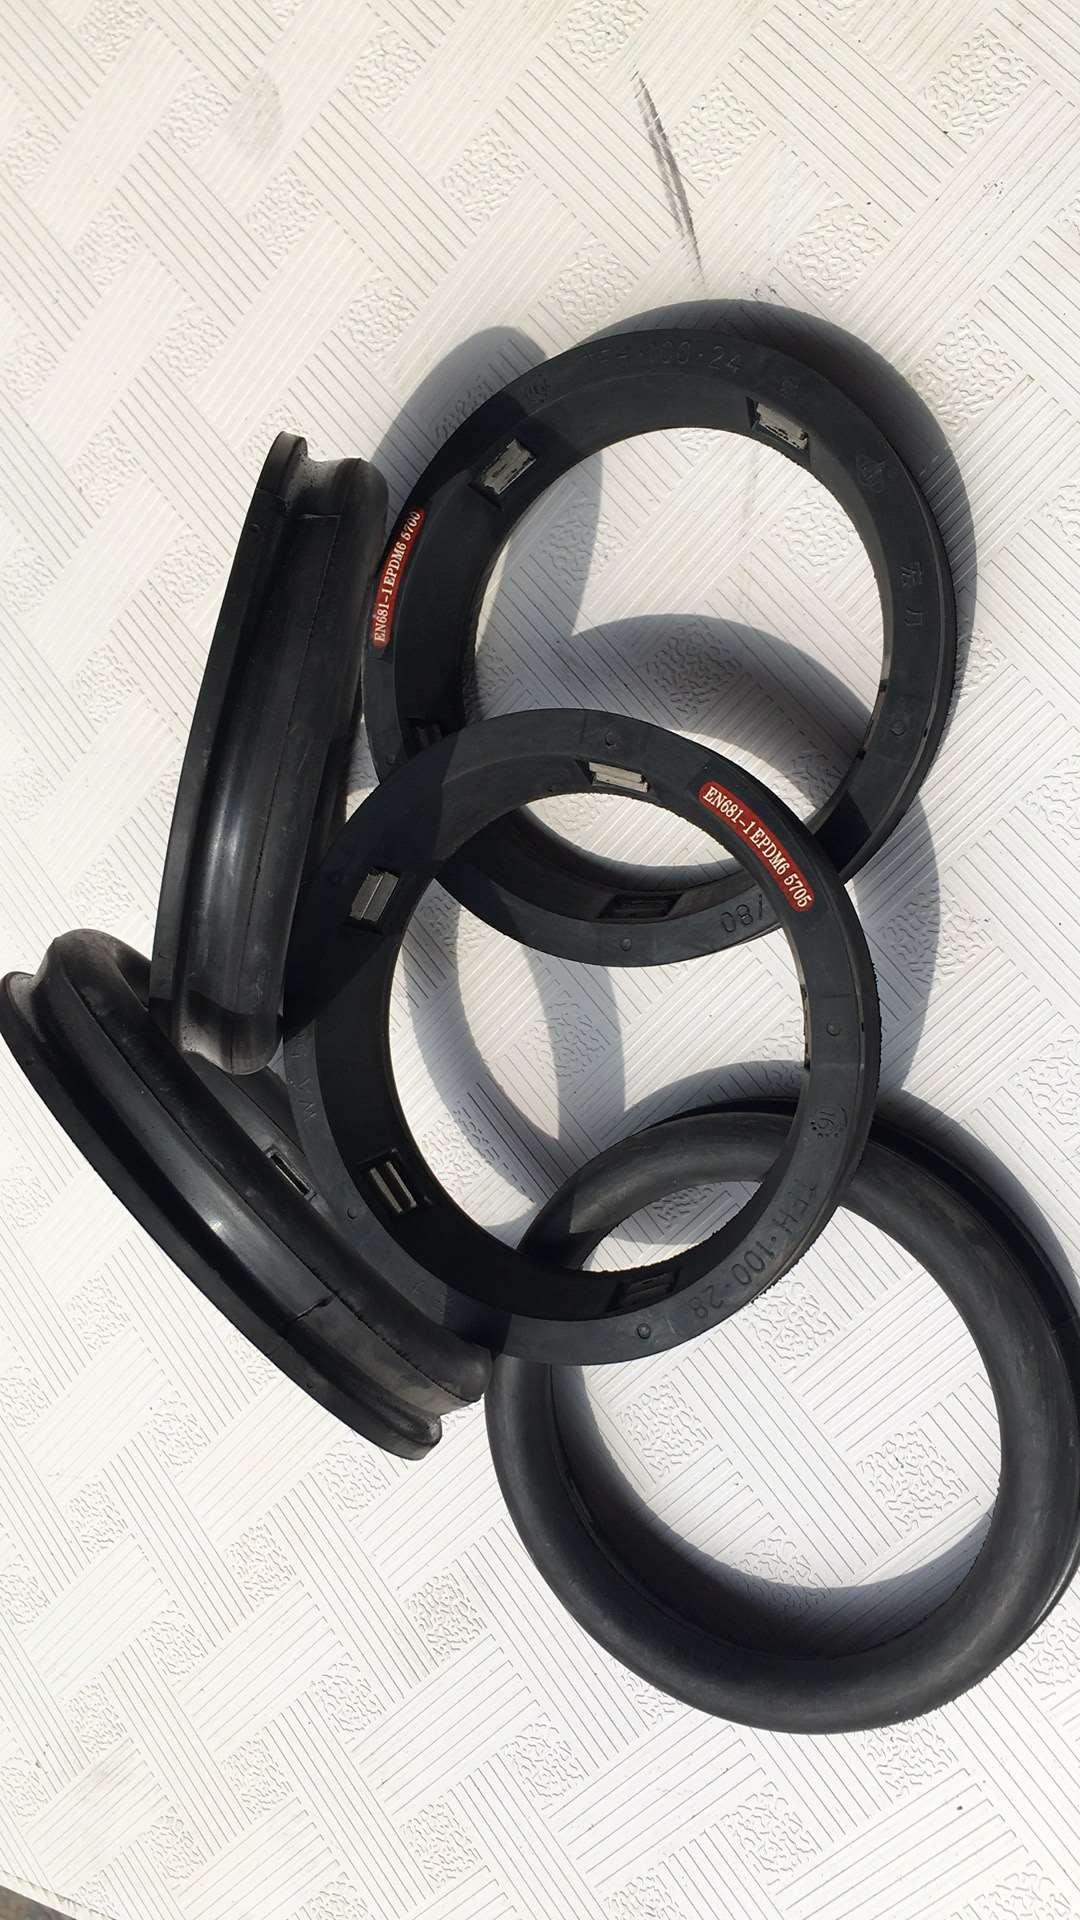 K9级T型接口球墨铸铁给水管承插口防脱T型胶圈,可领取元淘宝优惠券